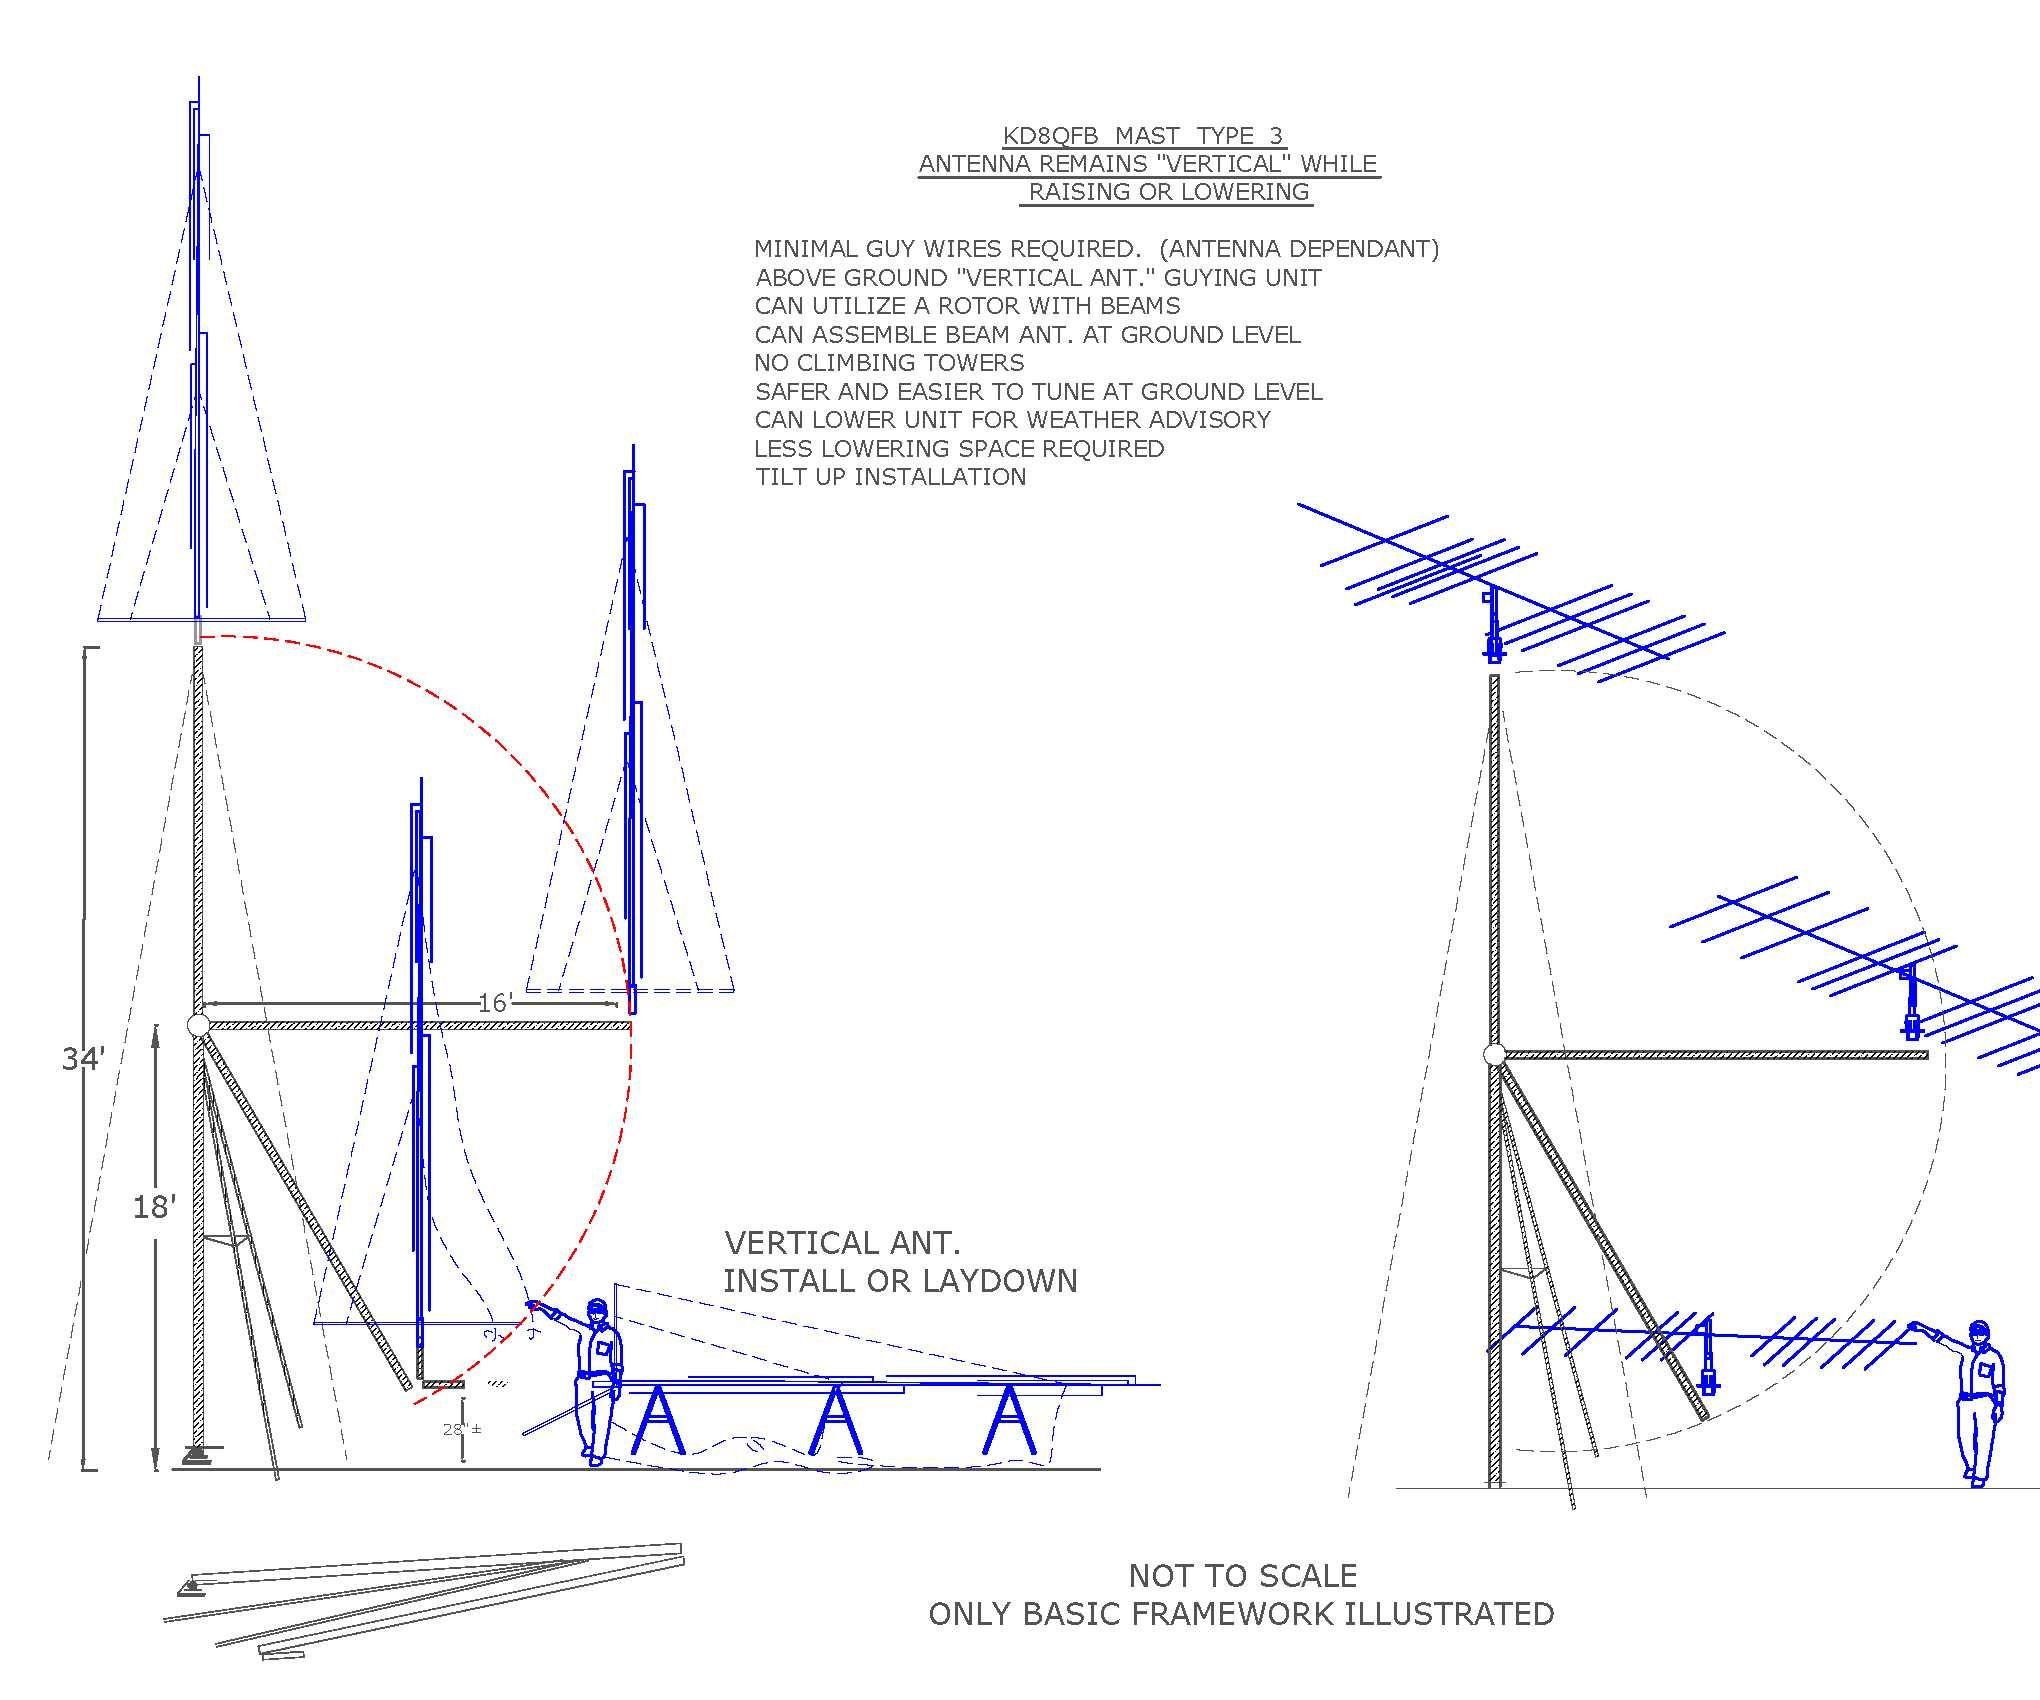 Ham Radio Mast  Construct Antenna at Ground Level in It's